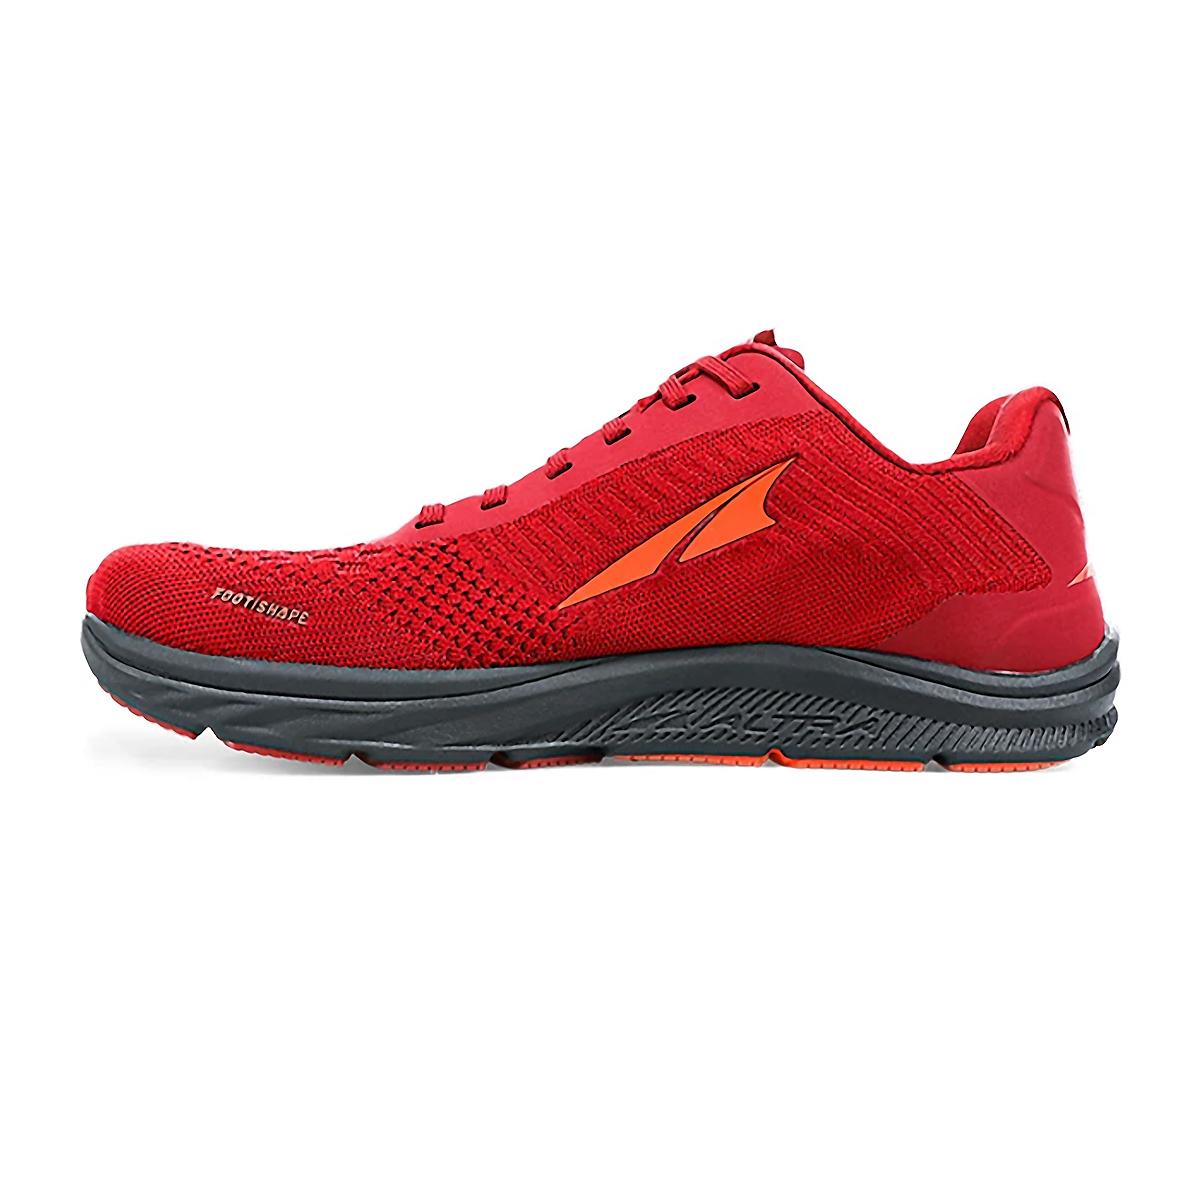 Men's Altra Torin 4.5 Plush Running Shoe - Color: Dark Red - Size: 7 - Width: Regular, Dark Red, large, image 2